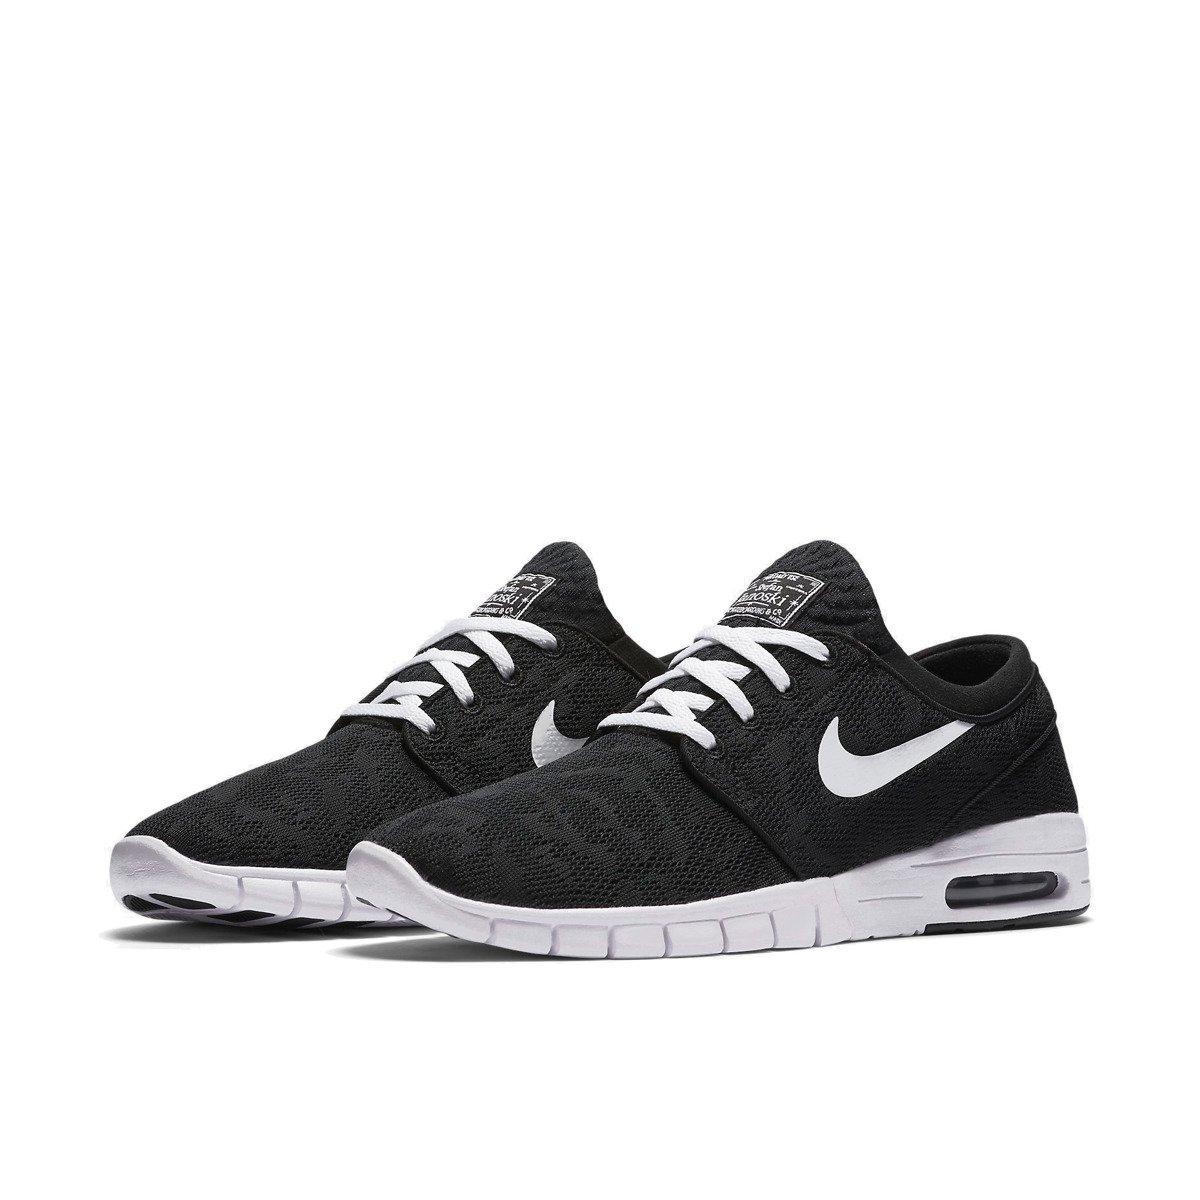 f1b884ea11e4 ... shoes nike sb stefan janoski max 631303-010 black white Click to zoom  ...